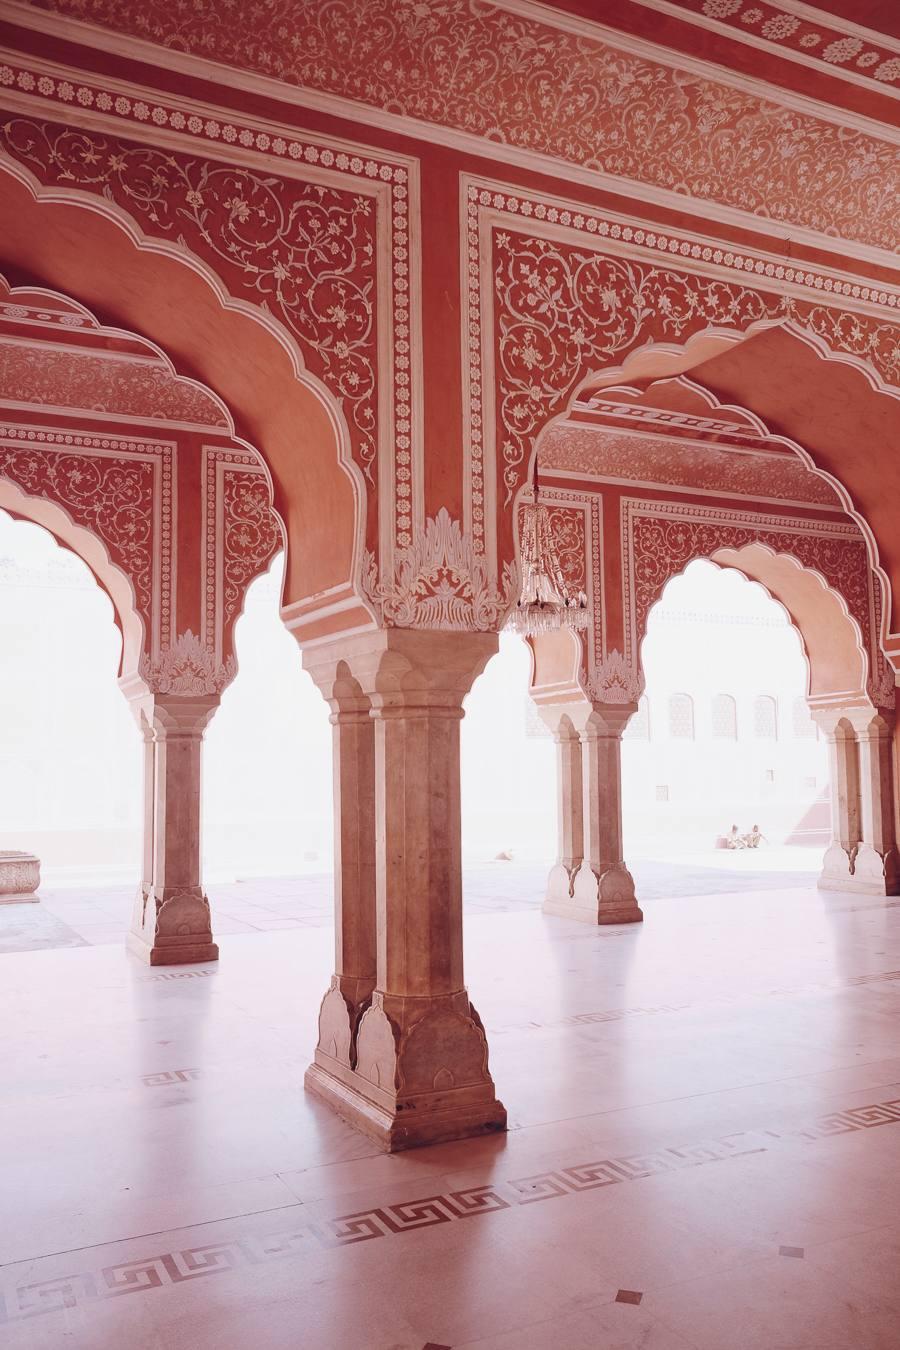 *Summer Travel Wish List: India